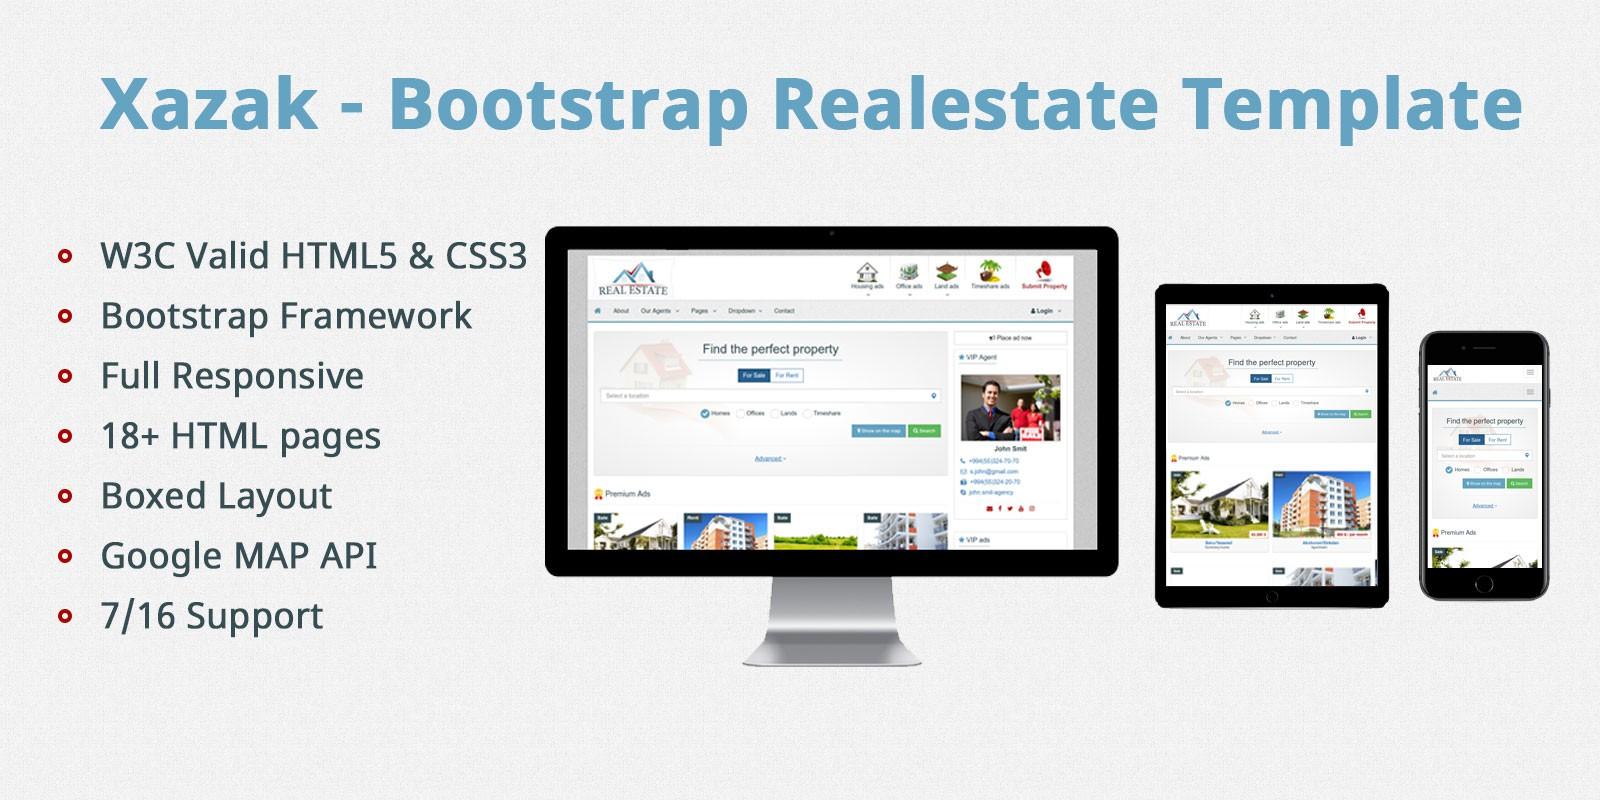 Xazak - Bootstrap Real Estate Template